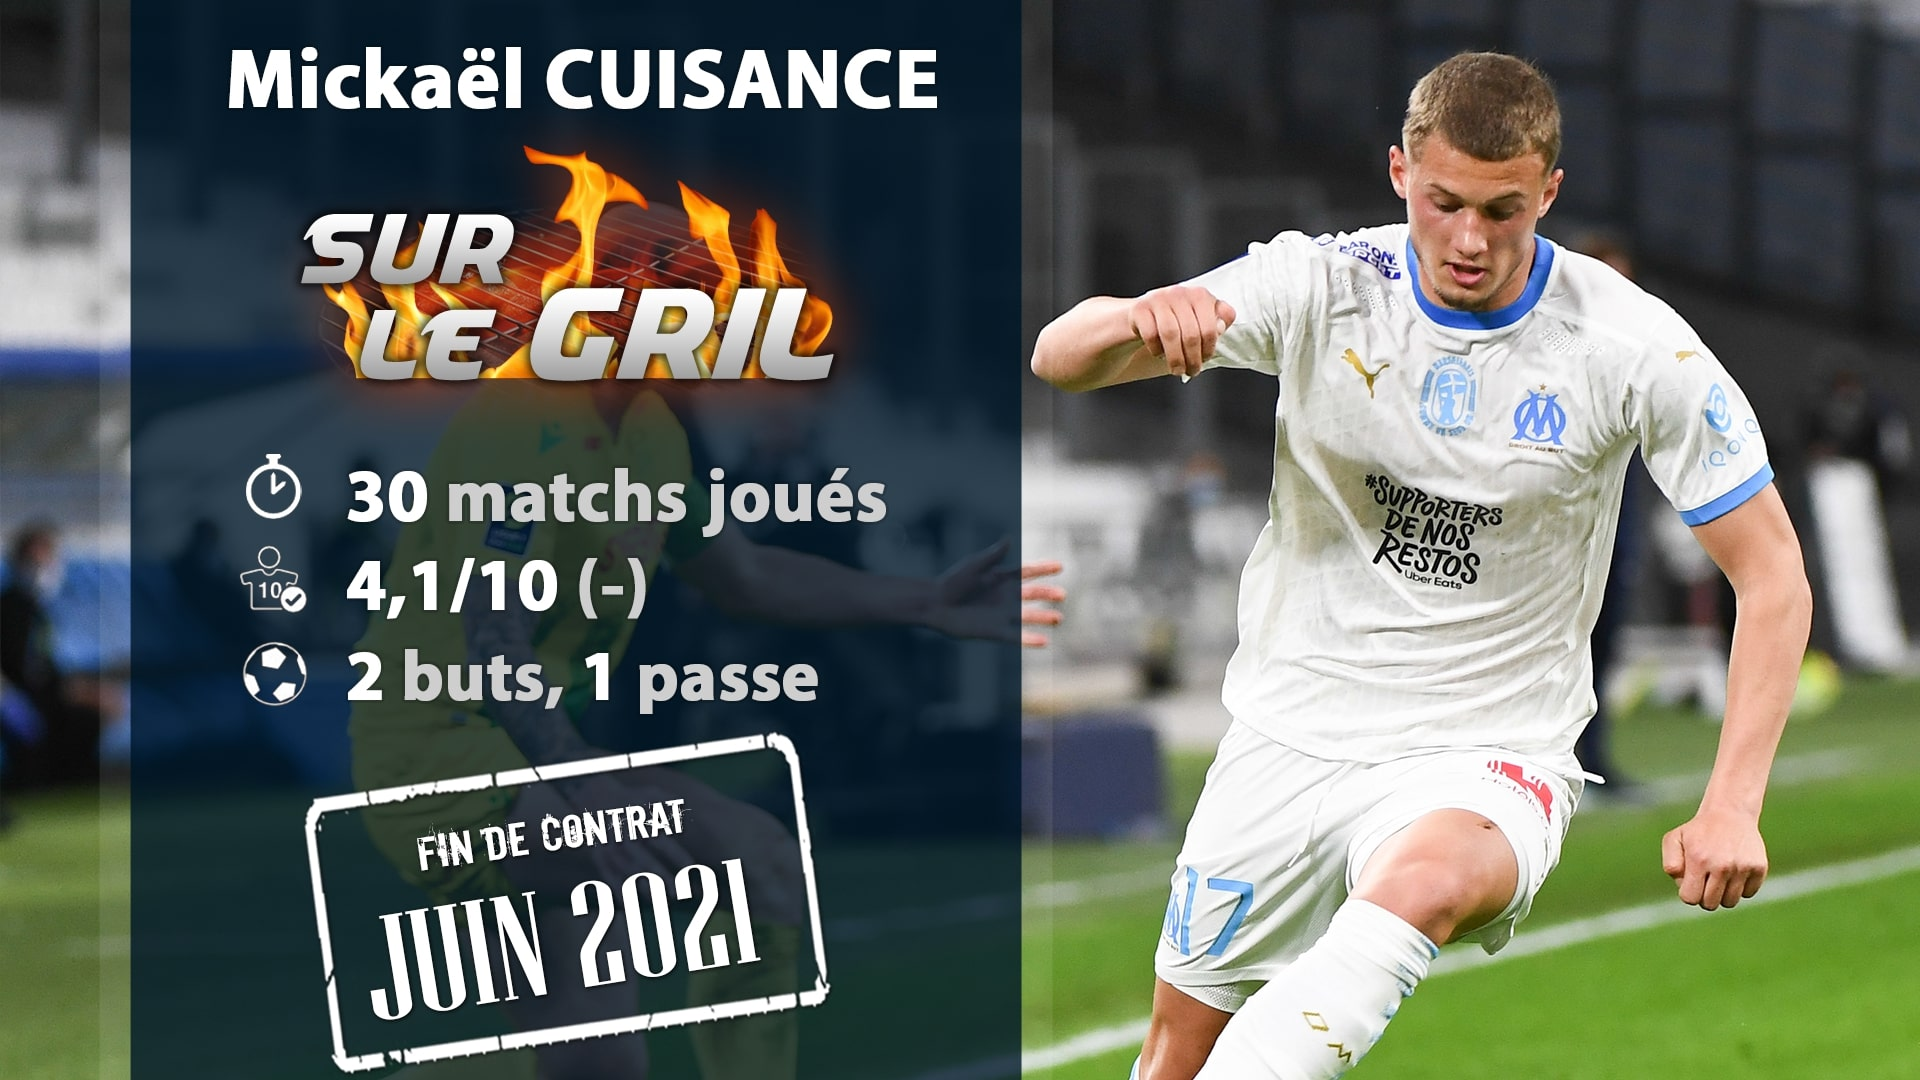 210524_cuisance_gril.jpg (263 KB)